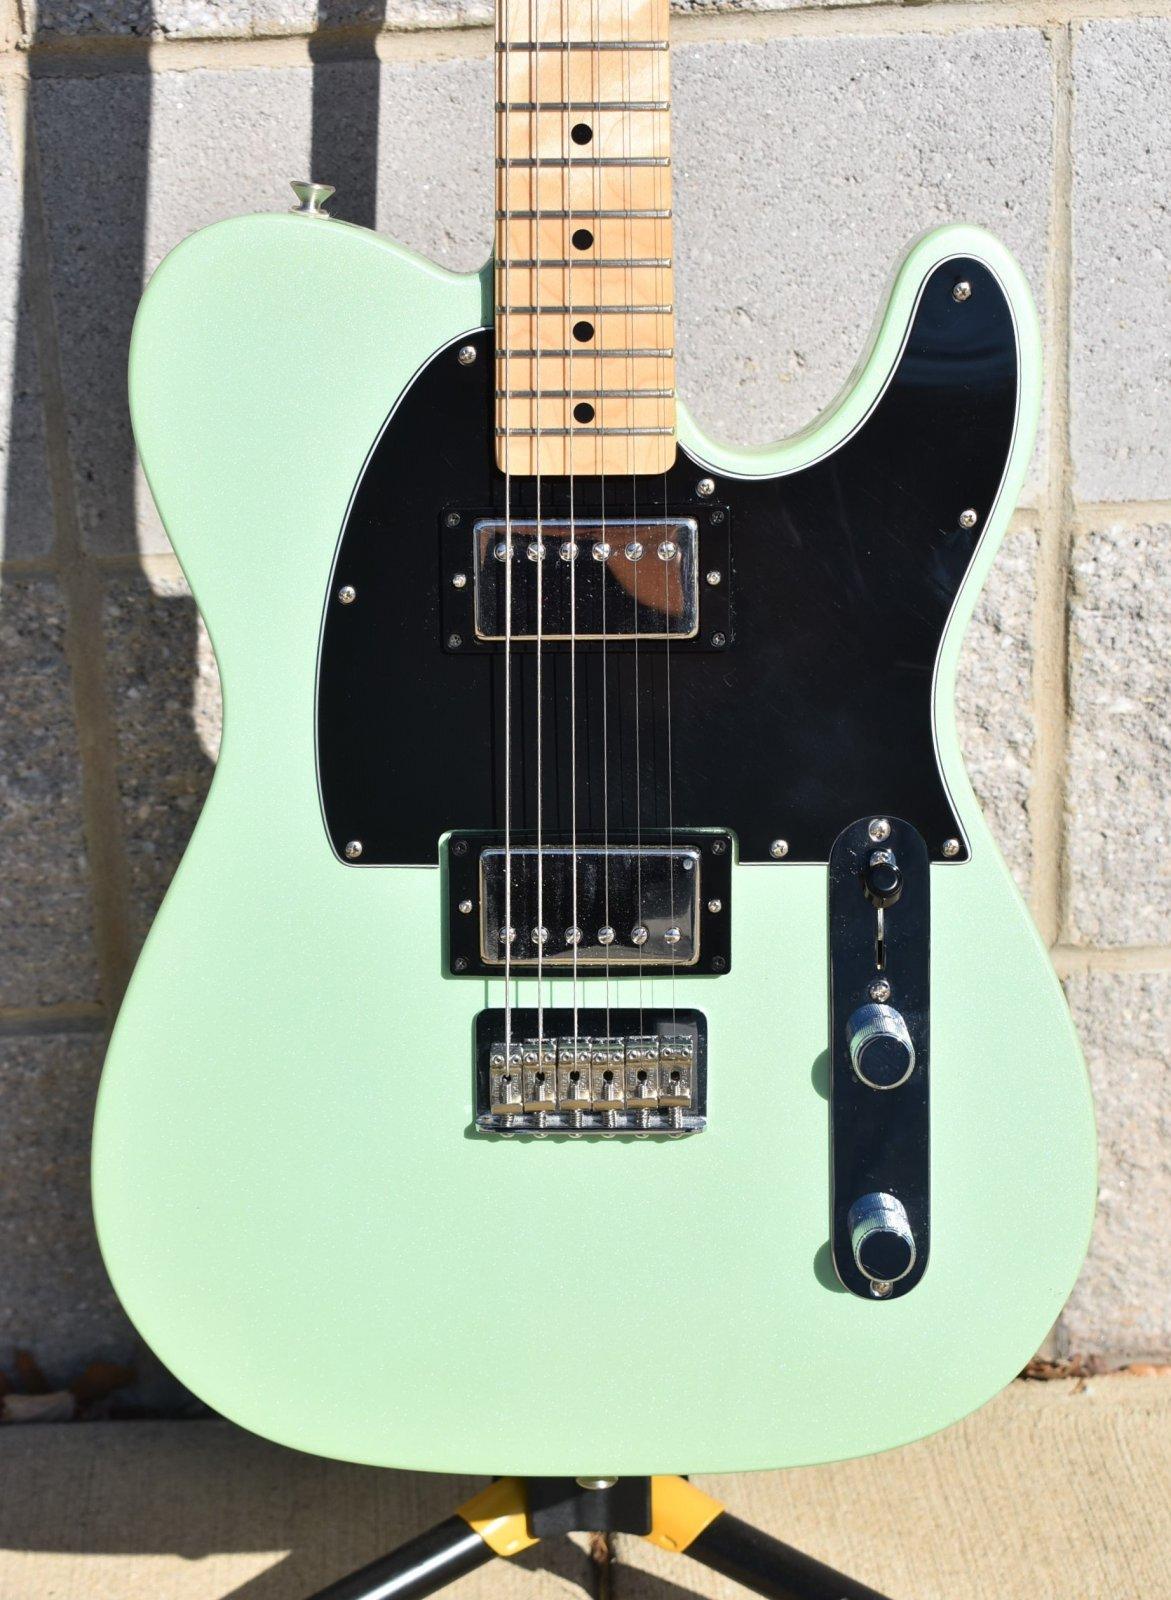 2017 Fender Standard Telecaster HH  - Sea Foam Pearl